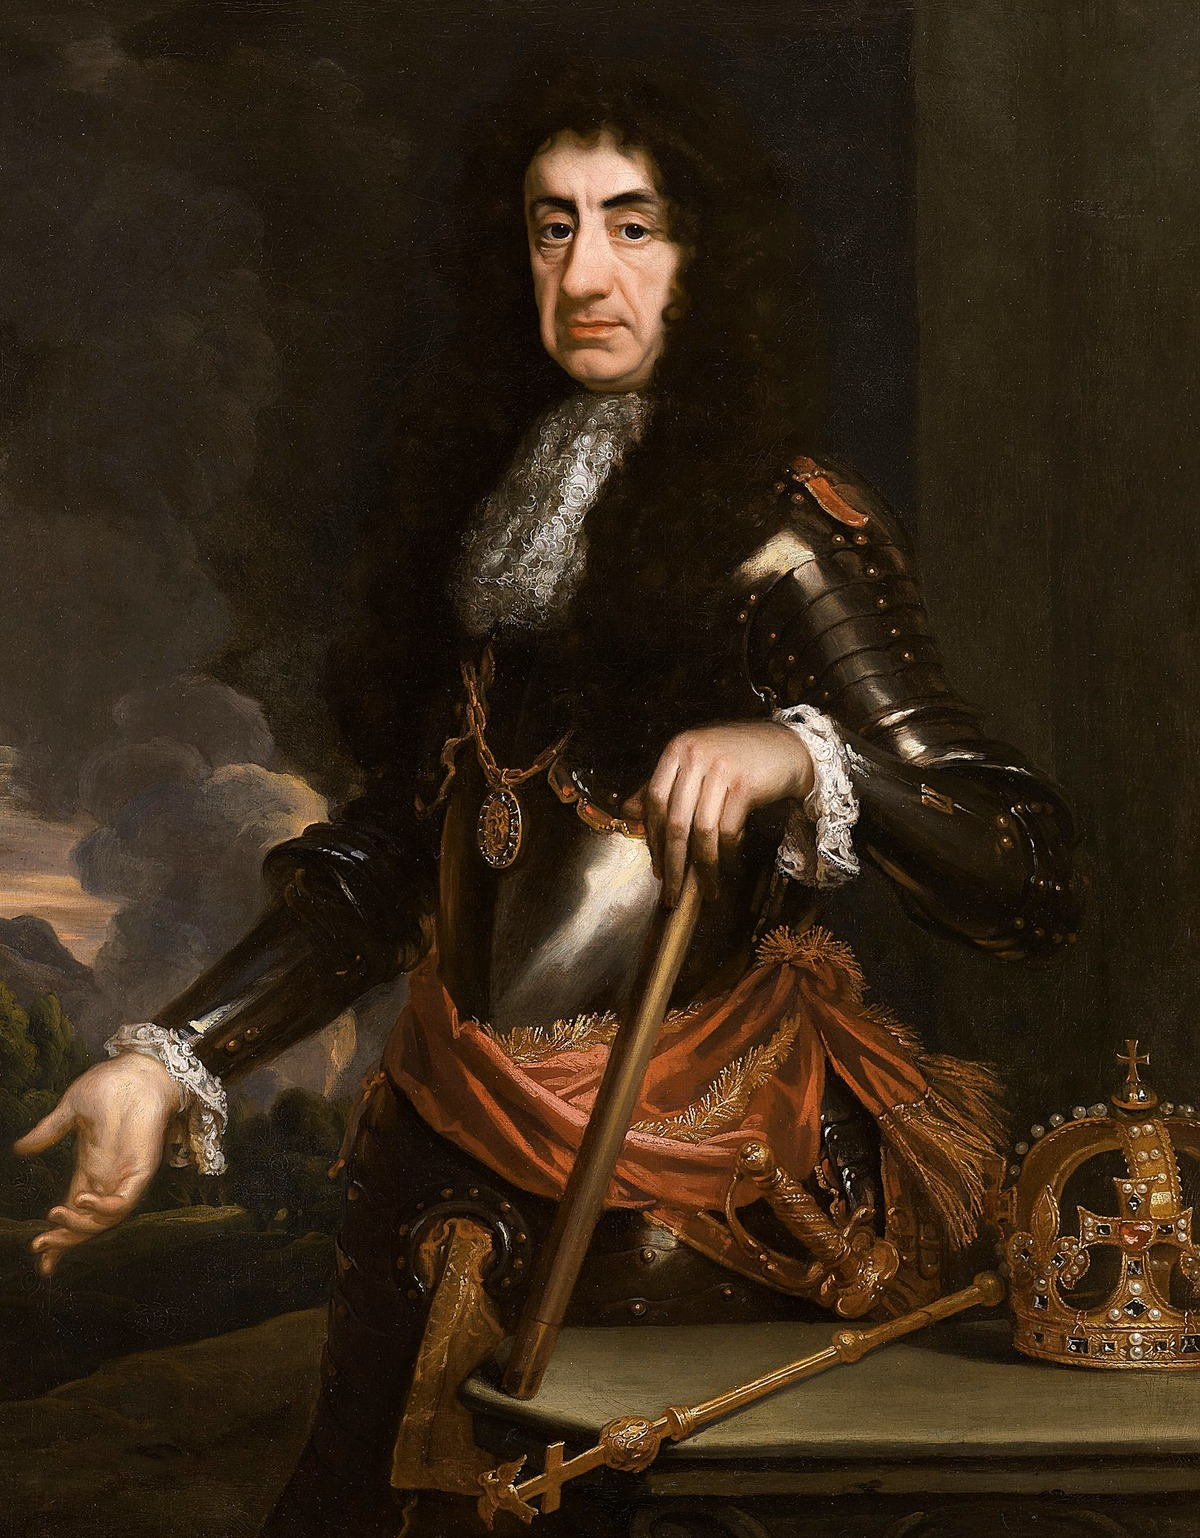 монархи великобритании хронология